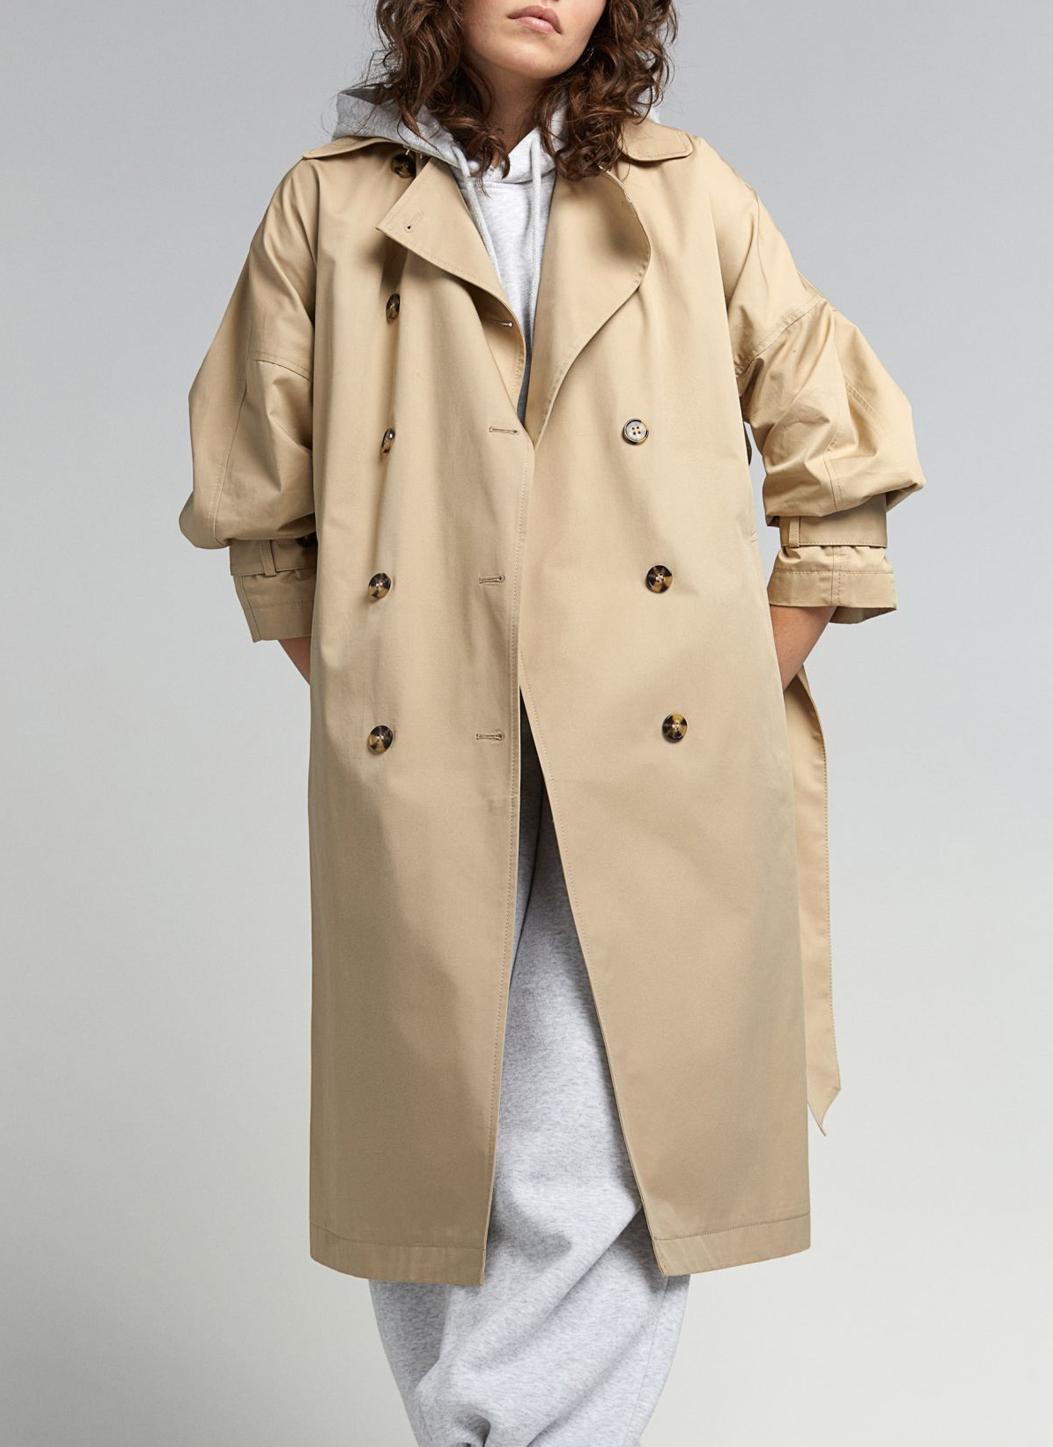 h&m beige trench coat 2021